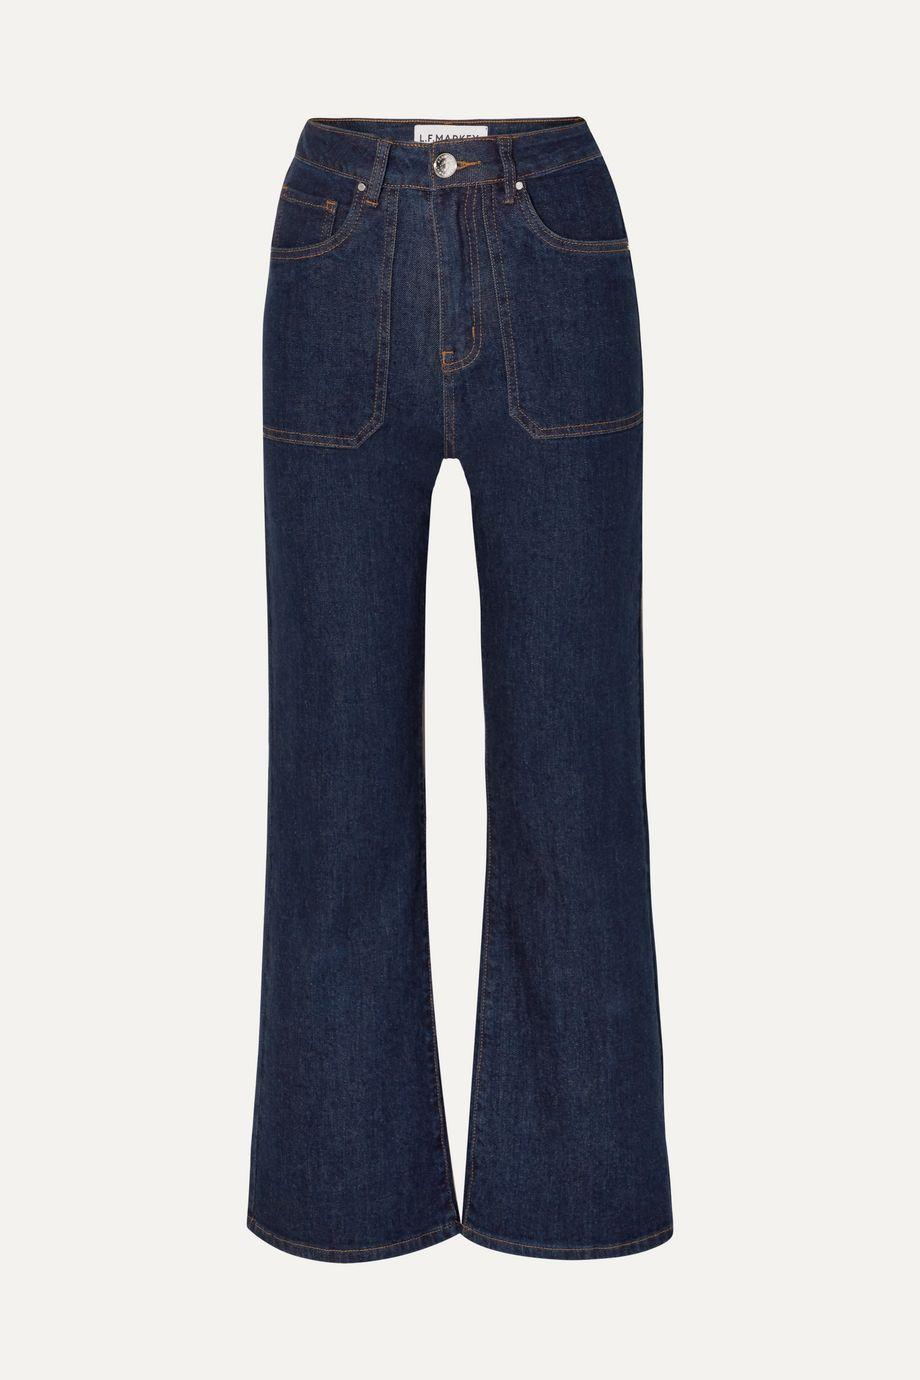 L.F.Markey Jimbo high-rise wide-leg jeans